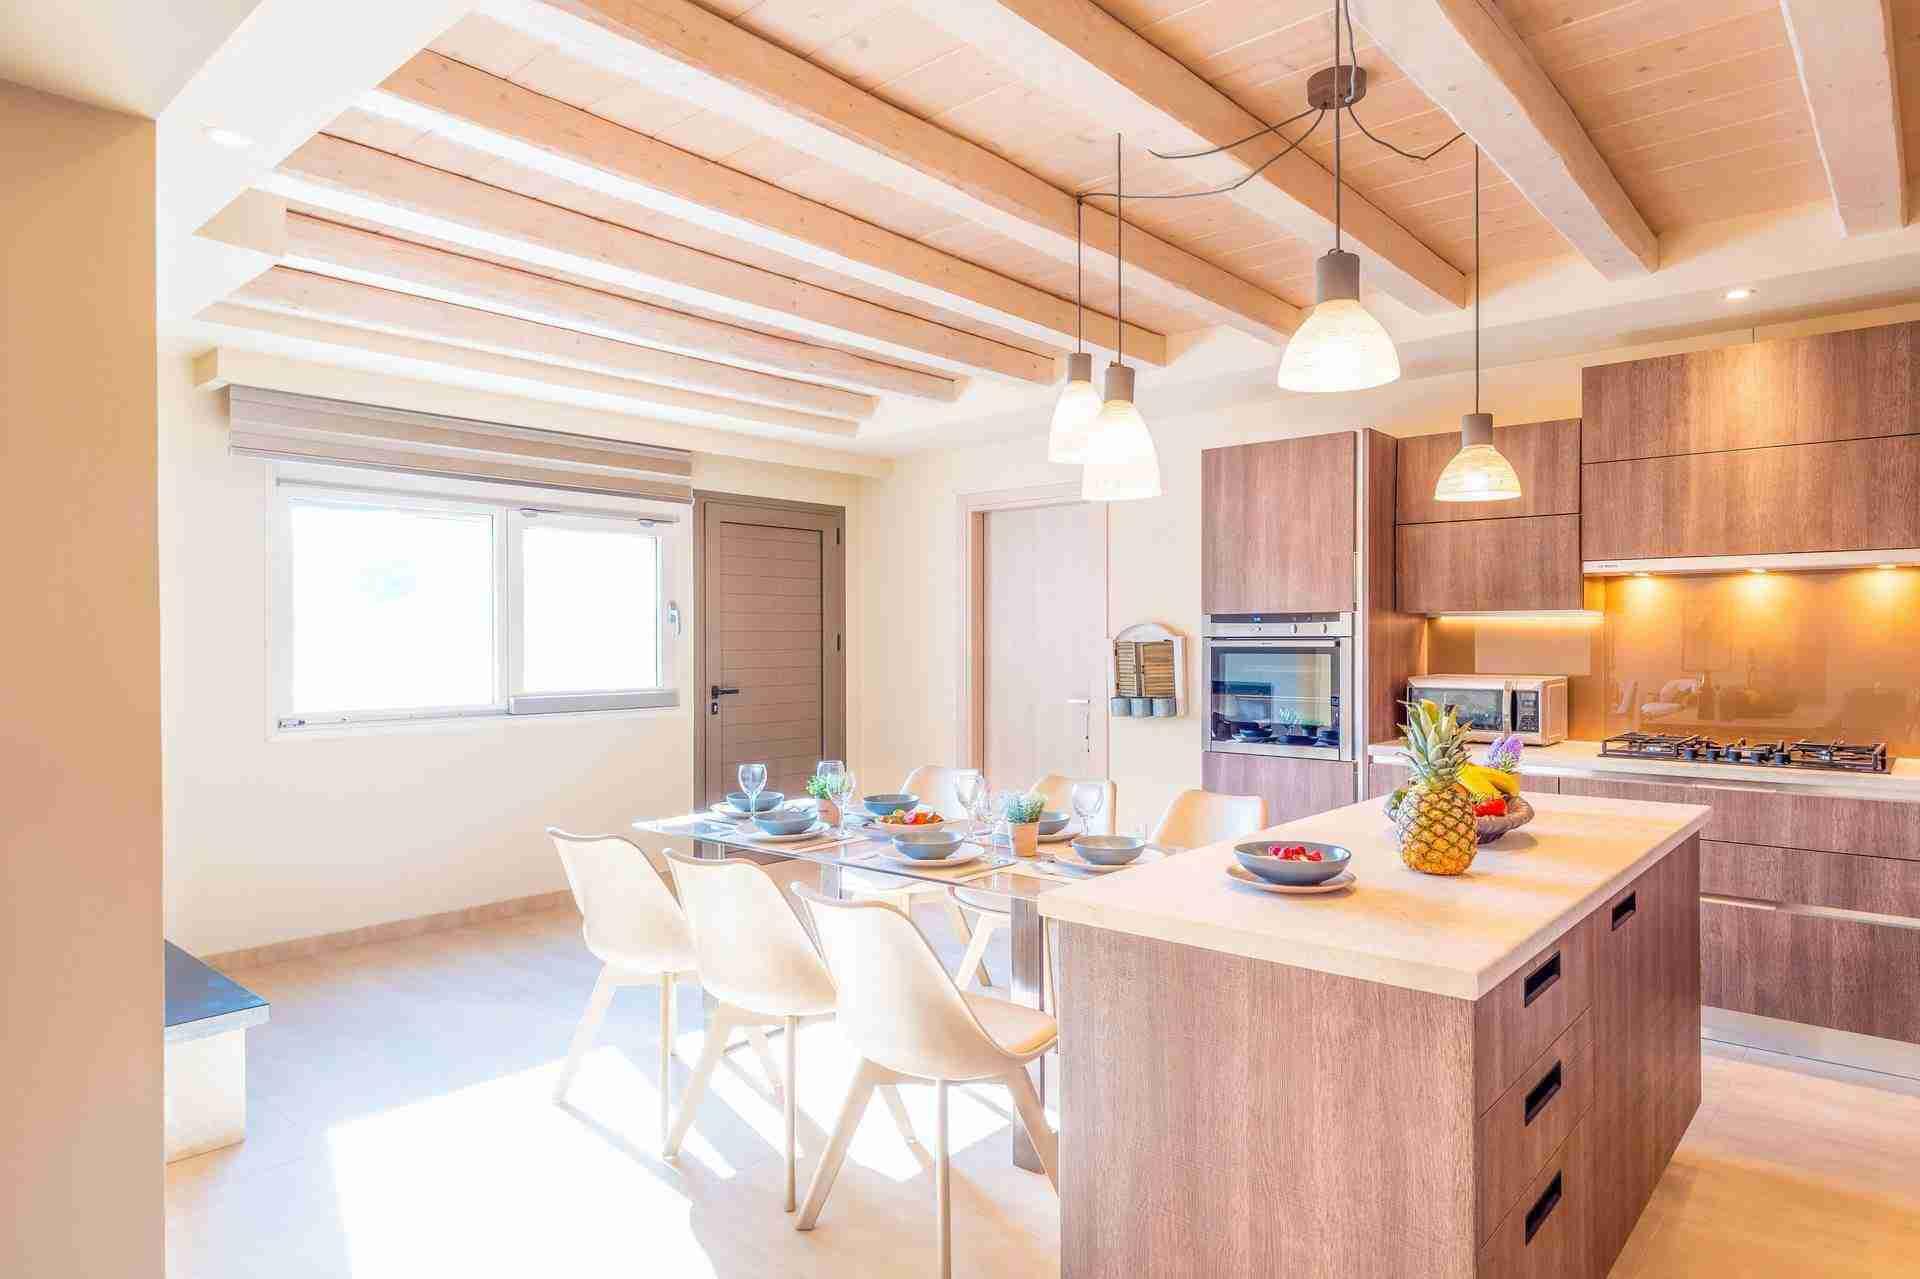 13 Petra kitchen